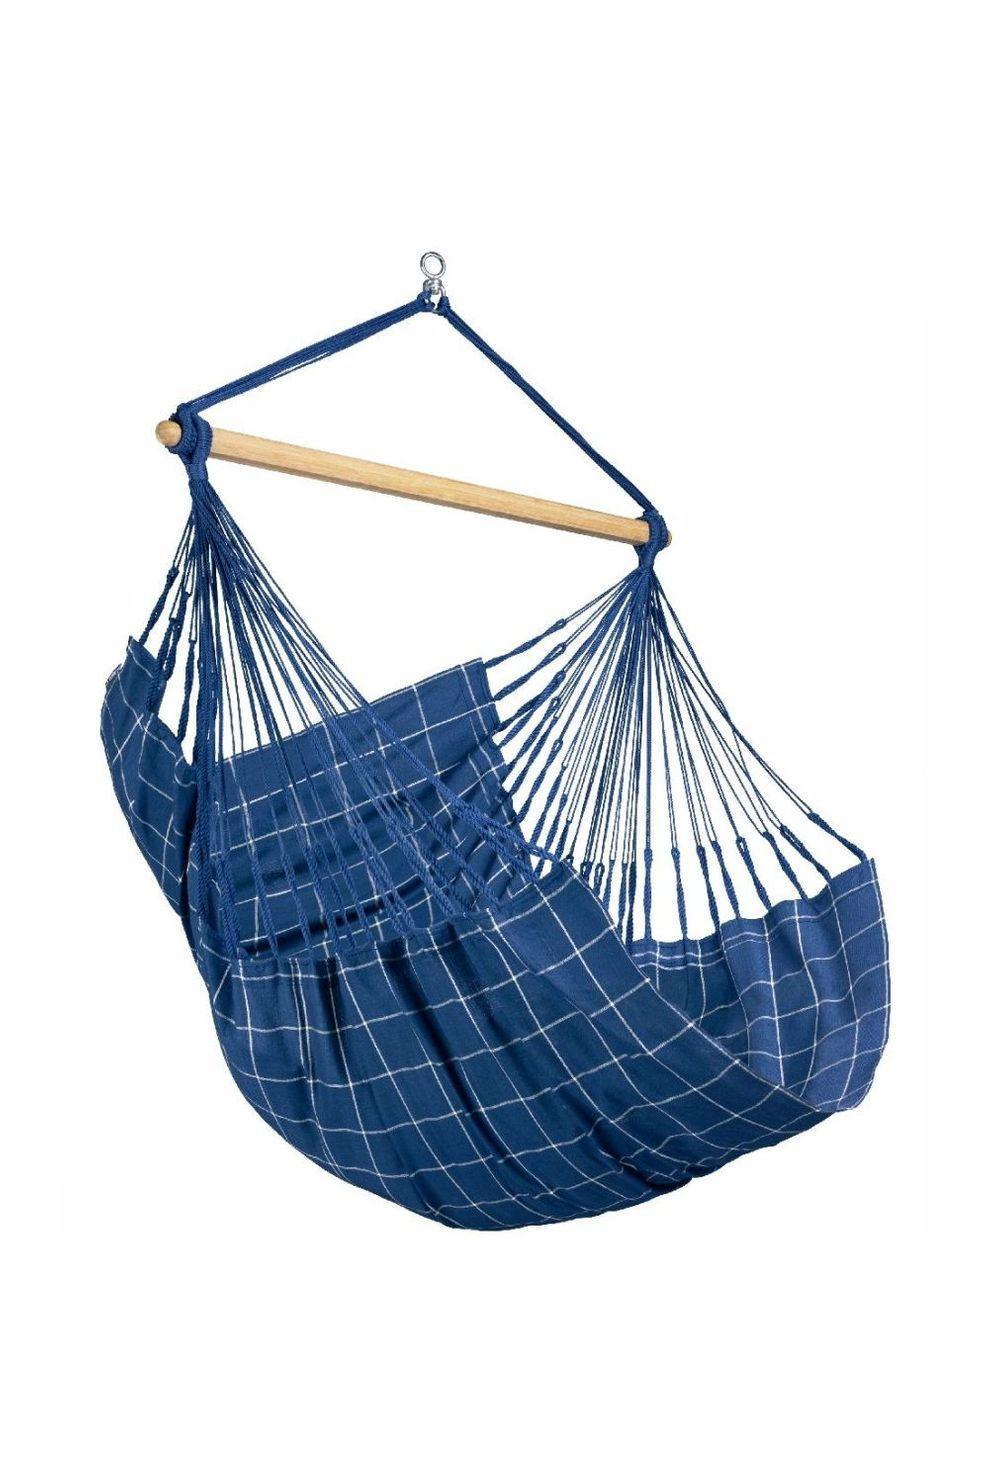 La Siesta Hangmat Domingo Hammock Chair - Blauw/ Gemengd